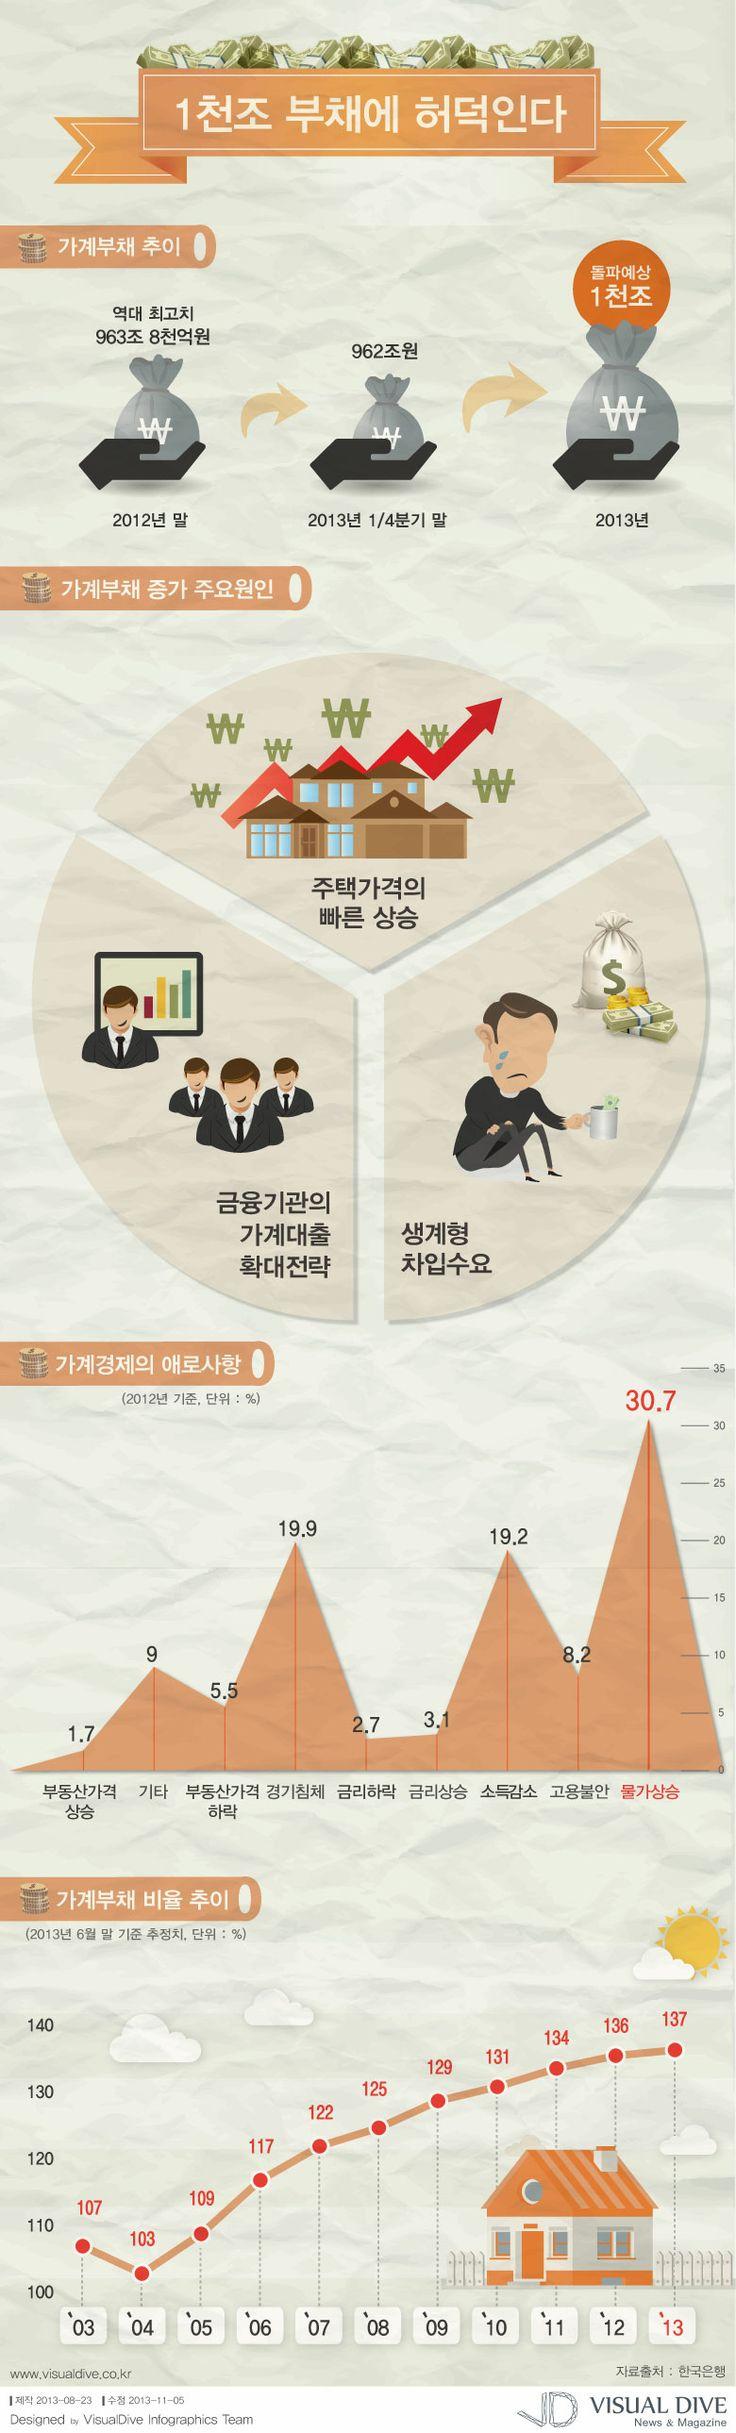 [Infographic] 가계부채증가에 관한 인포그래픽